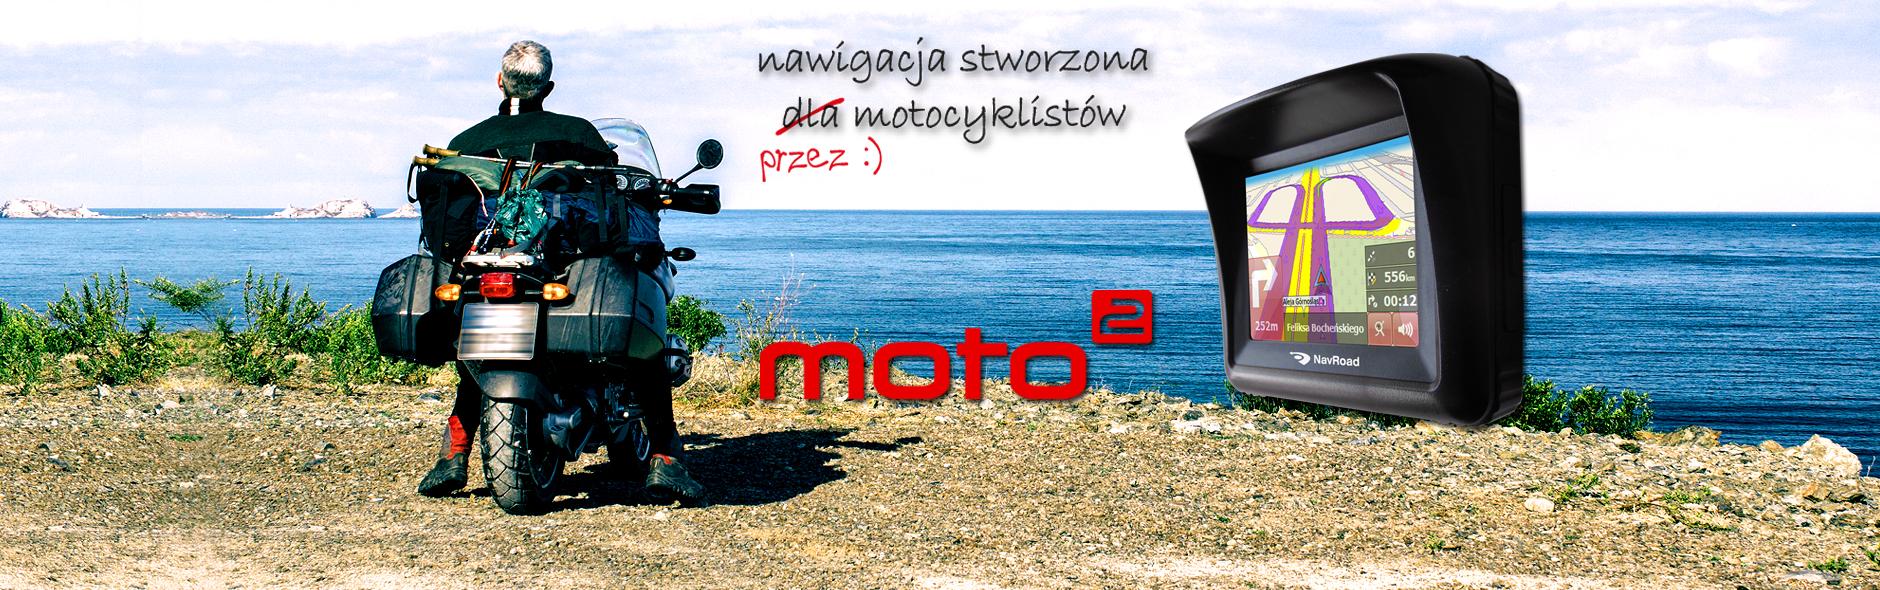 MOTO2_banner_2016 OK copy